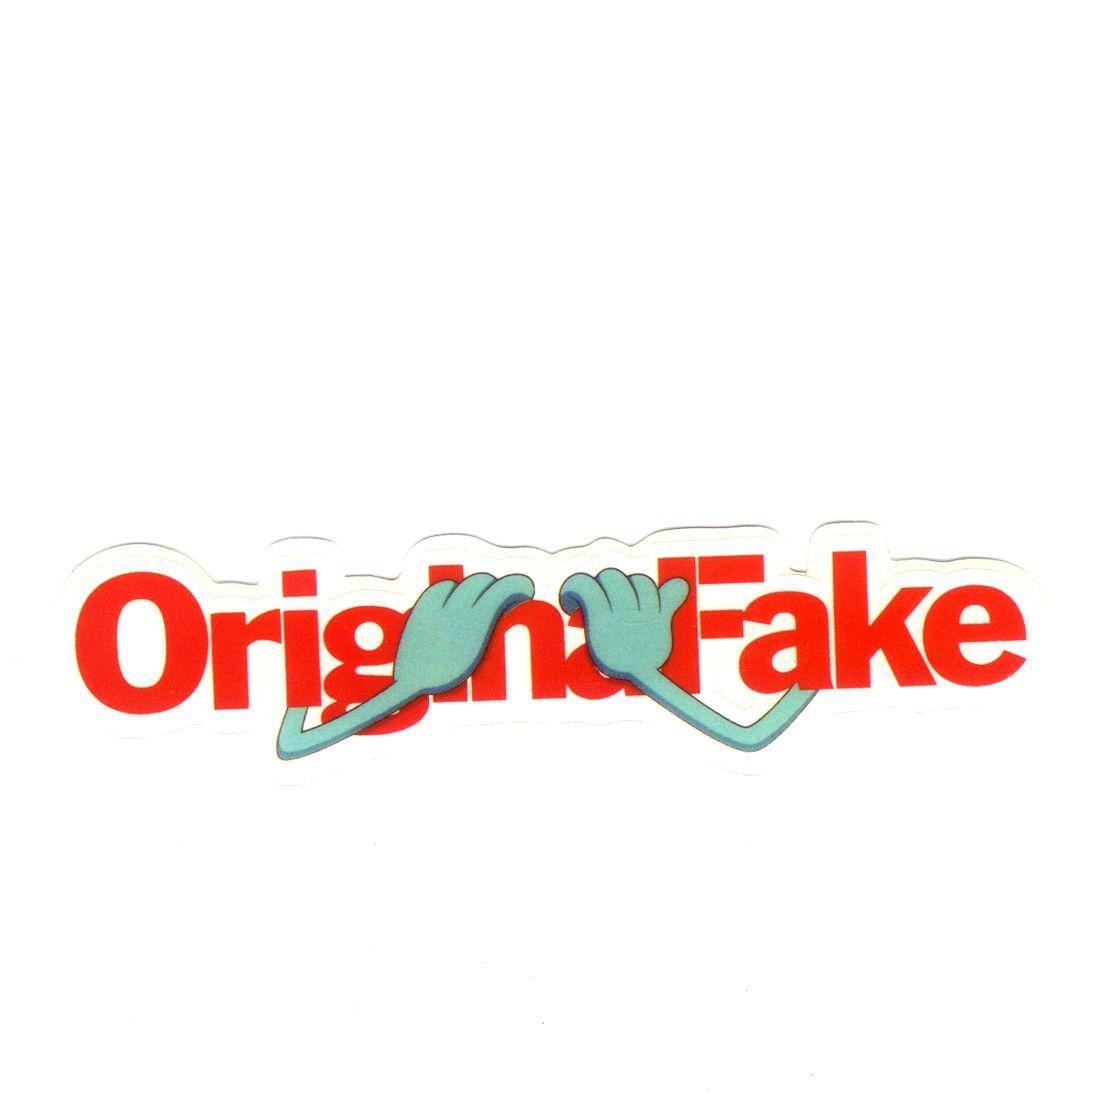 Kaws OriginalFake Red Logo X Cm Decal Sticker - Business invoice templates free kaws online store